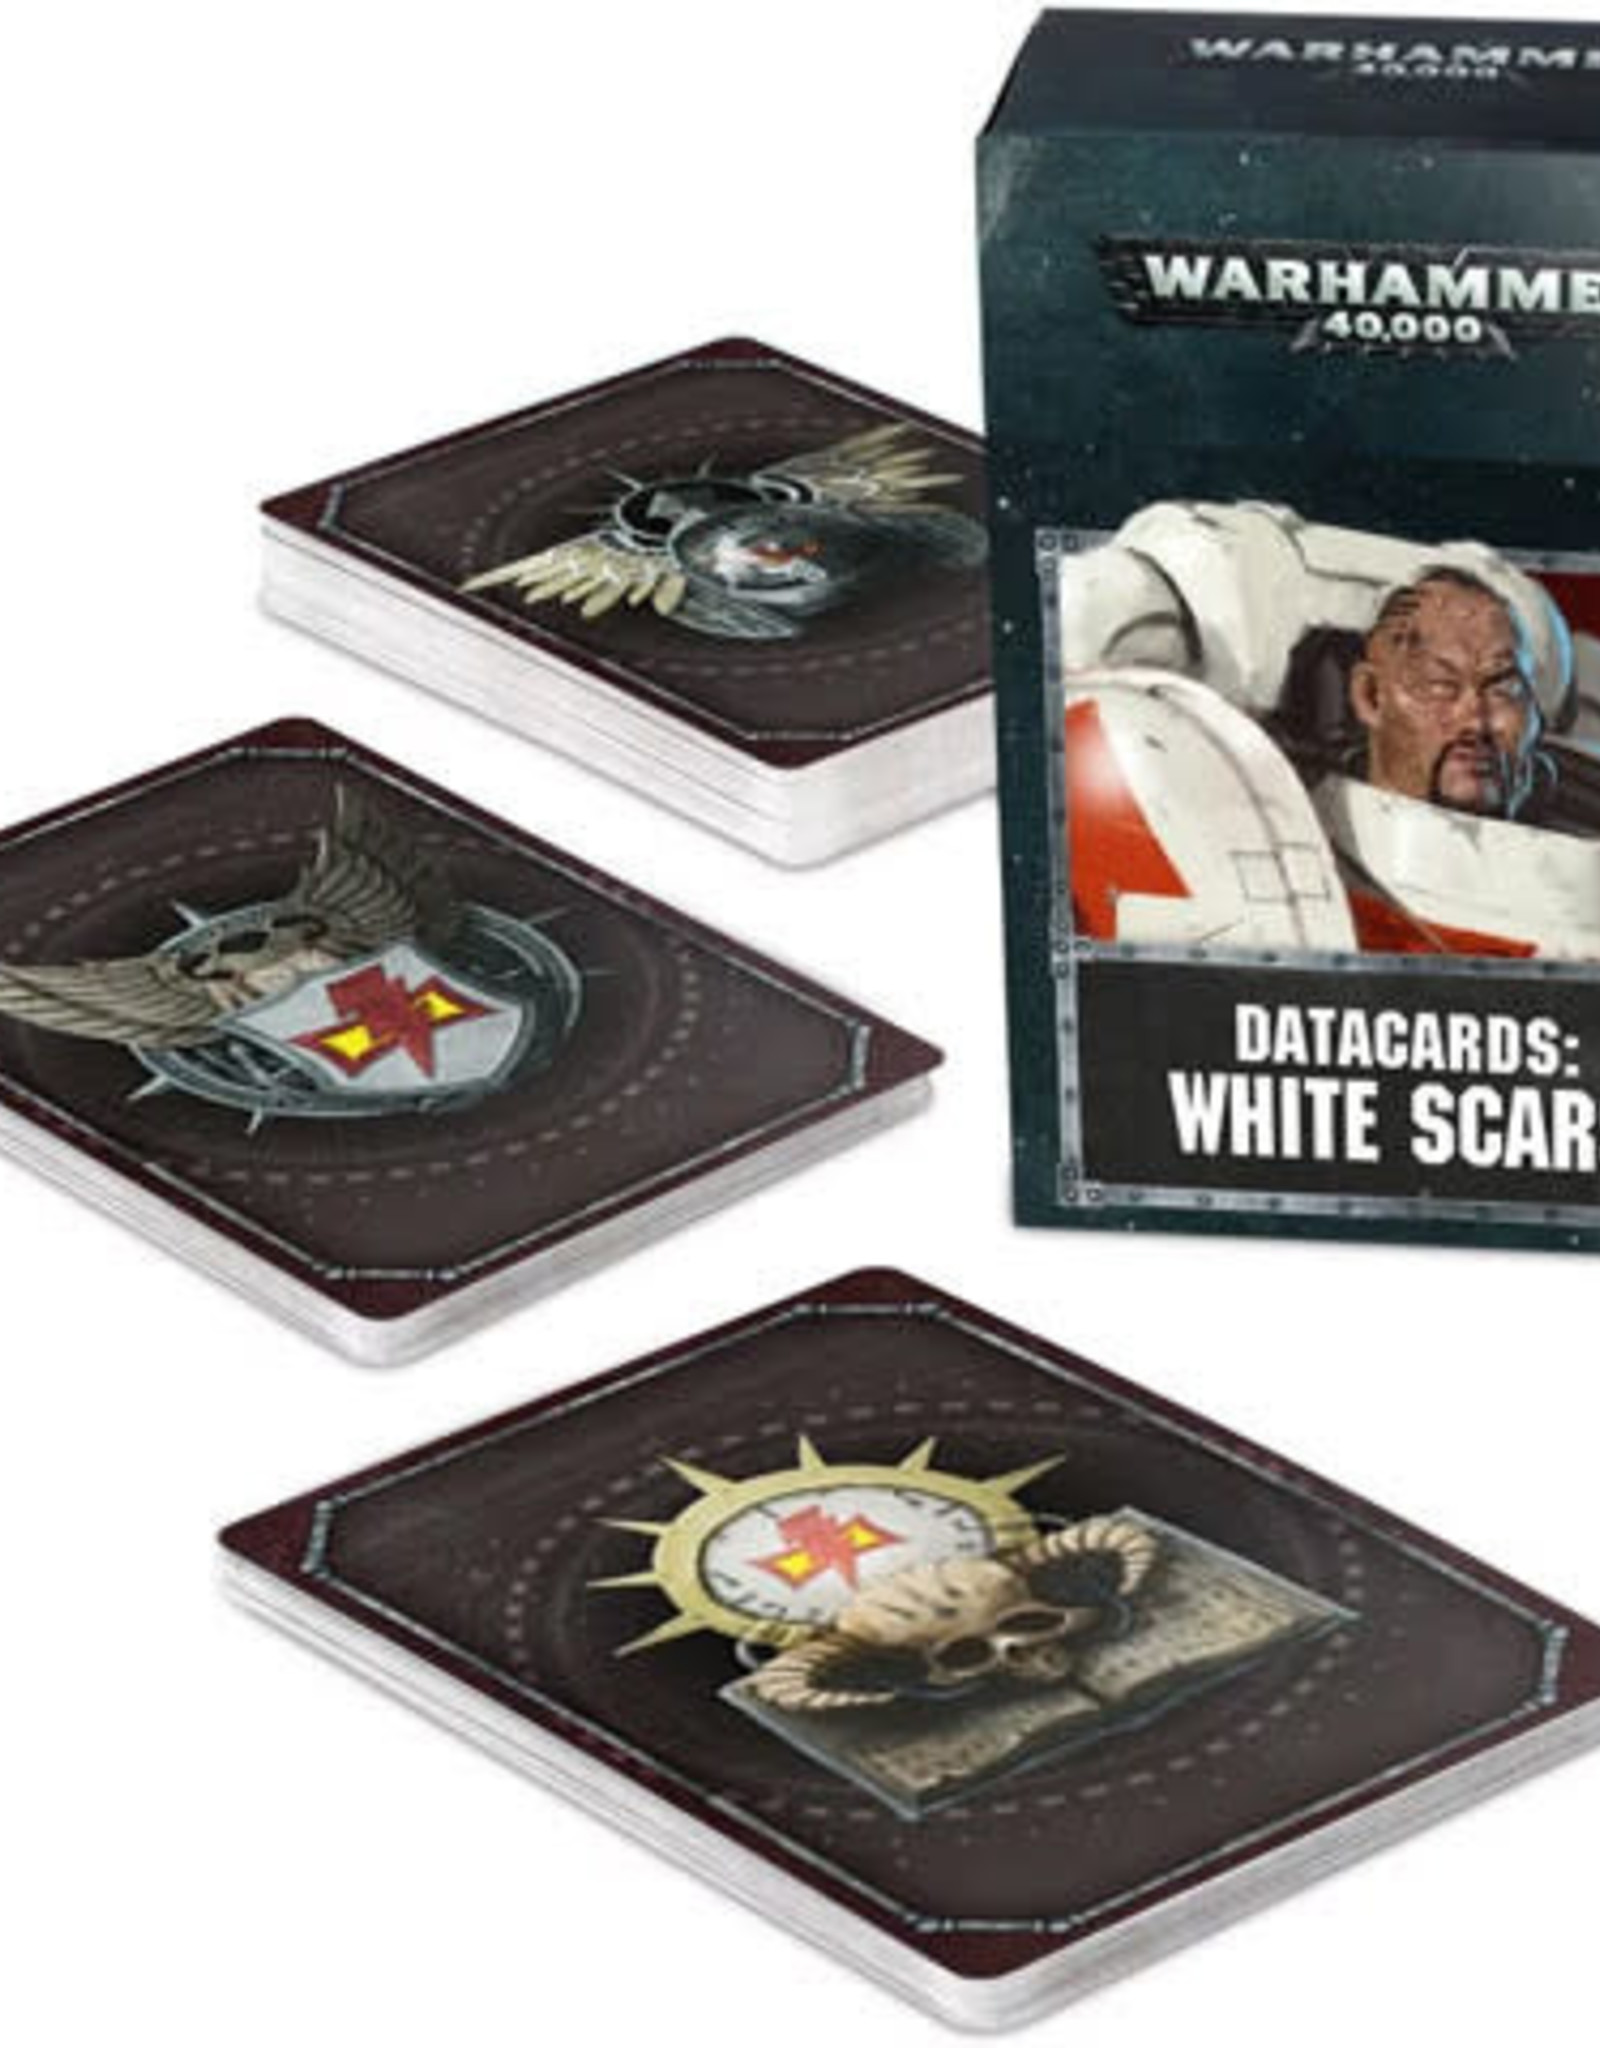 Warhammer 40K Datacards: White Scars